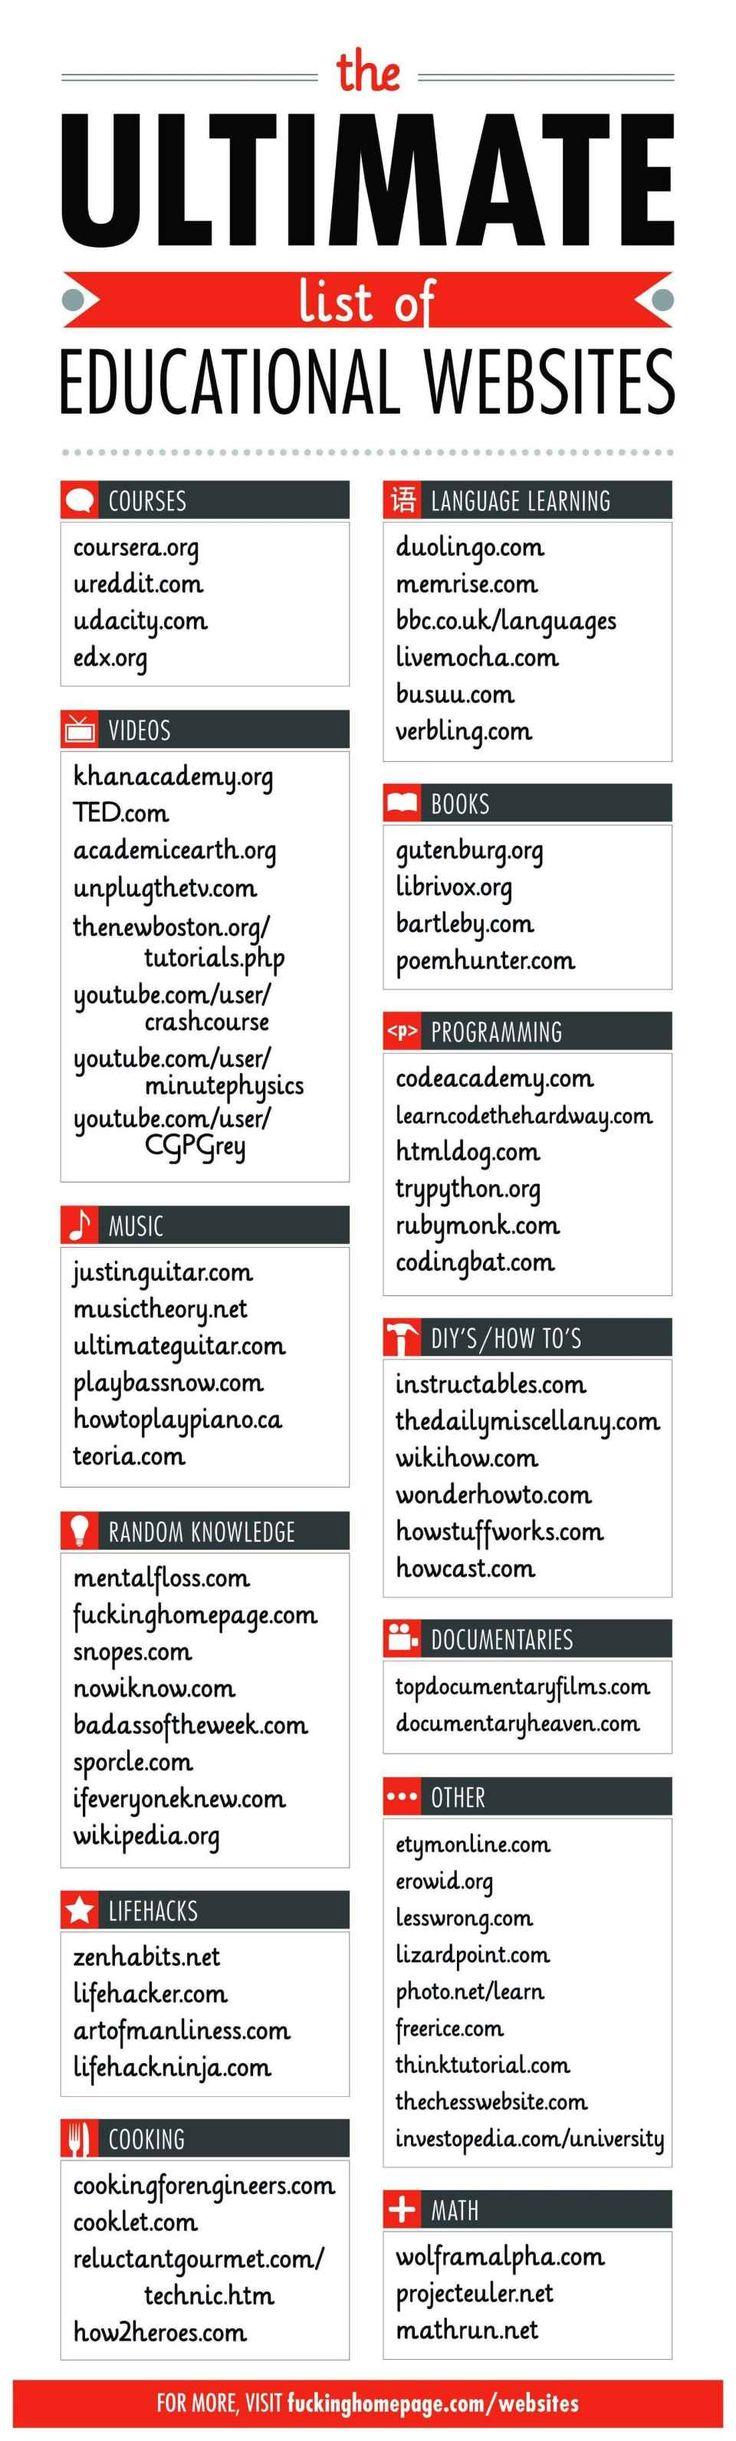 The Ultimate List of Educational Websites - UltraLinx